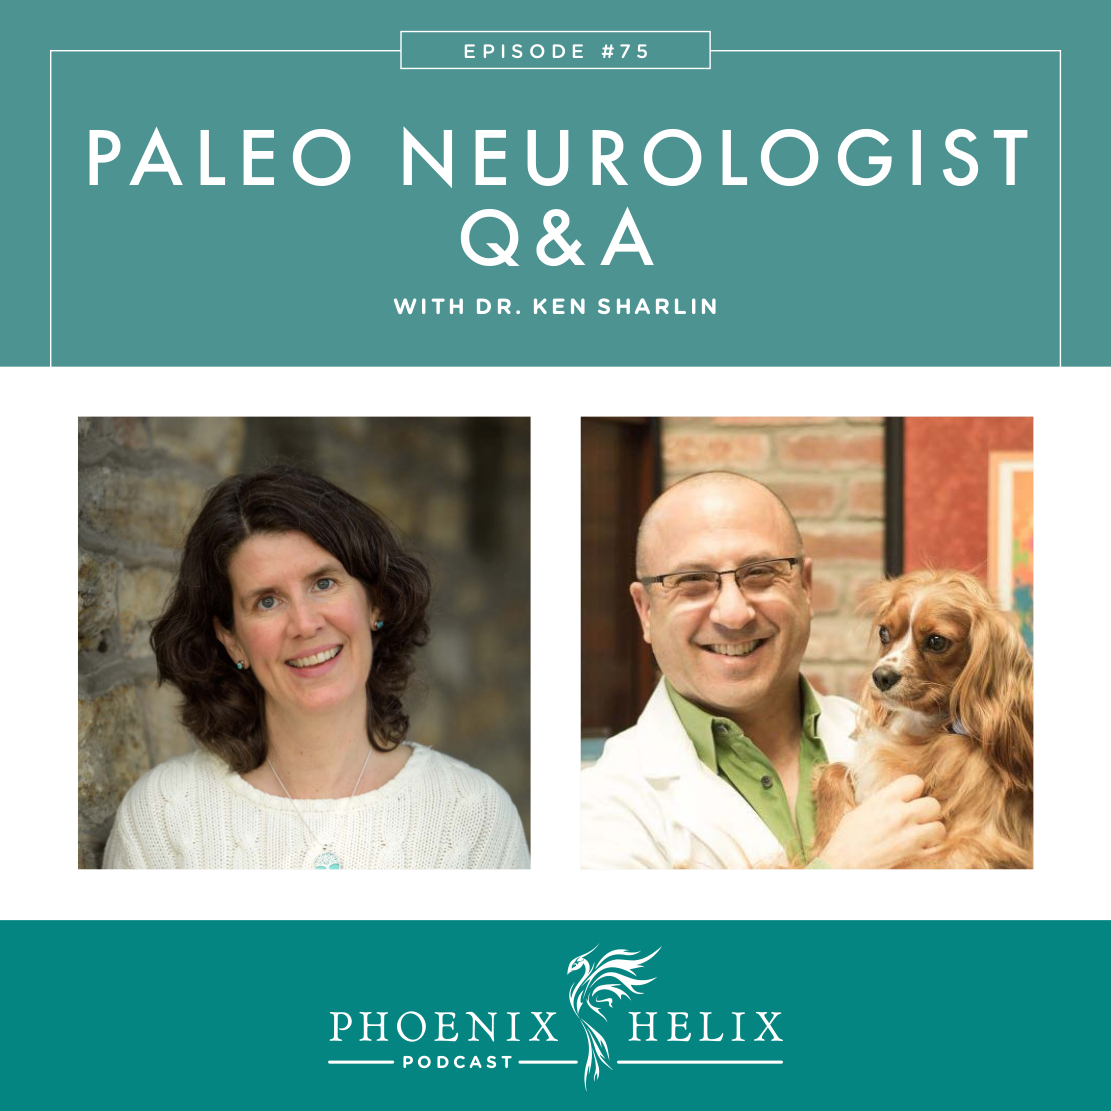 Paleo Neurologist Q&A with Dr. Ken Sharlin | Phoenix Helix Podcast